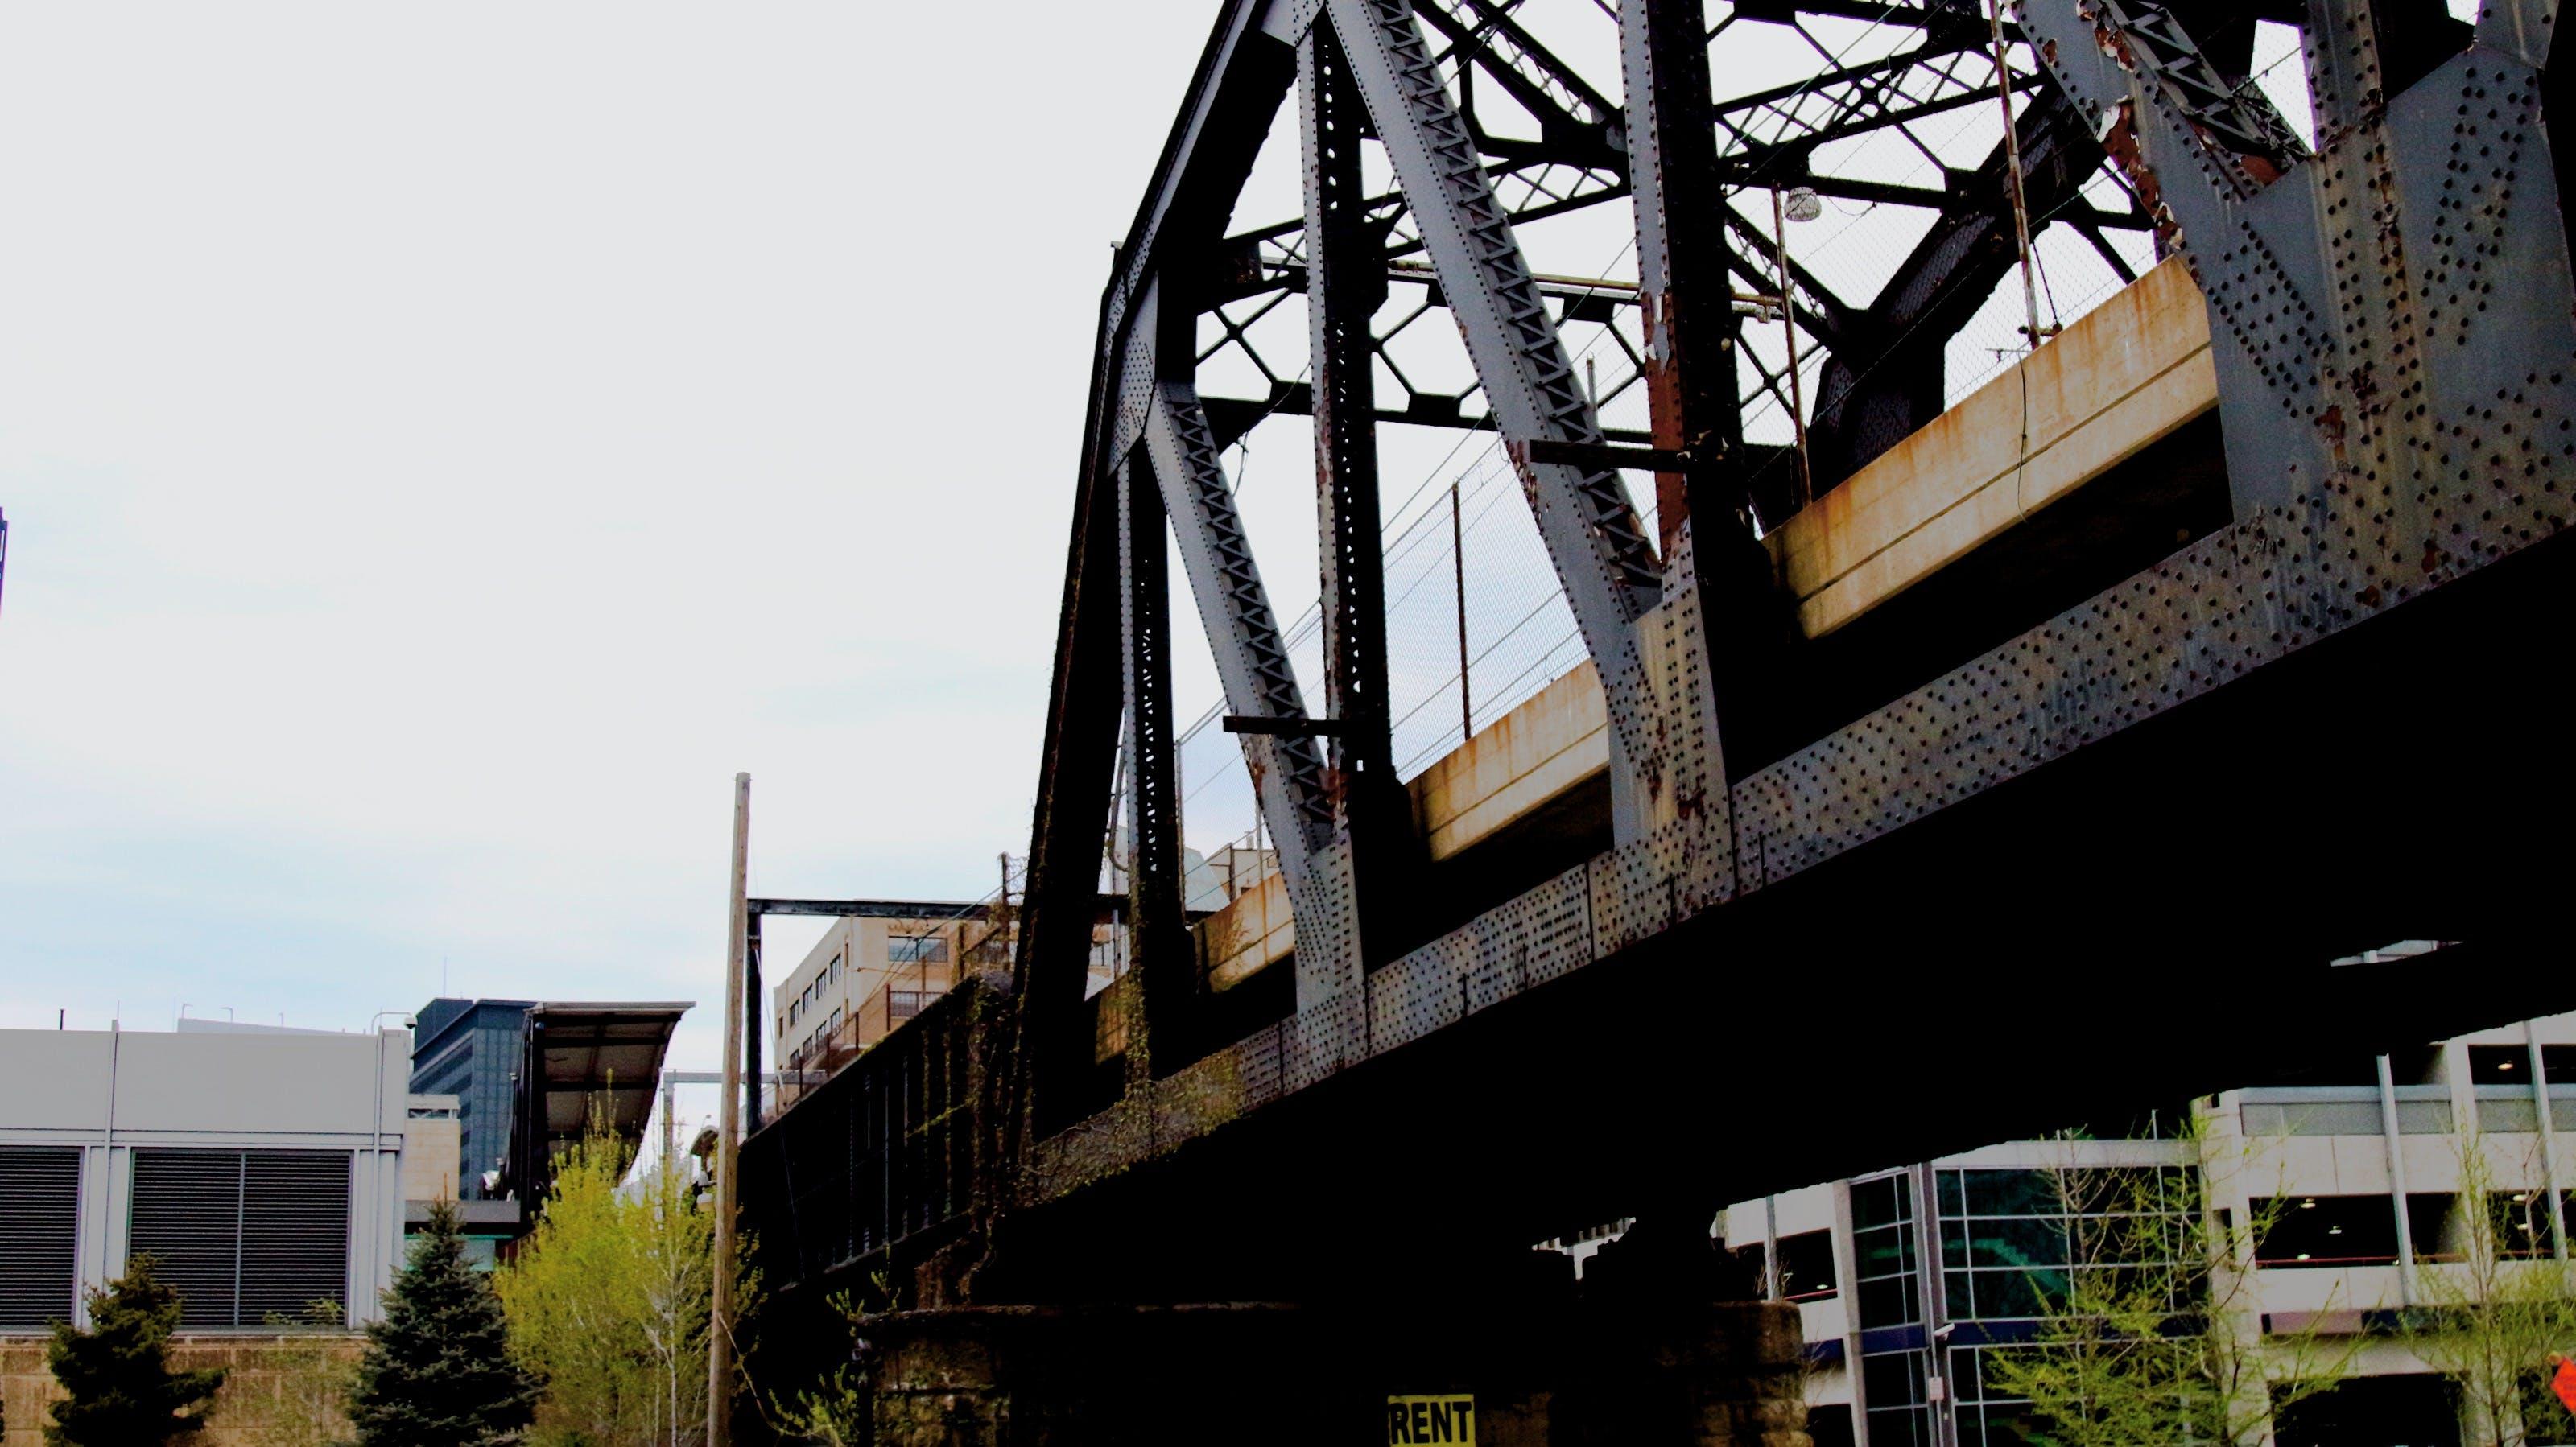 Free stock photo of city, sky, bridge, rust